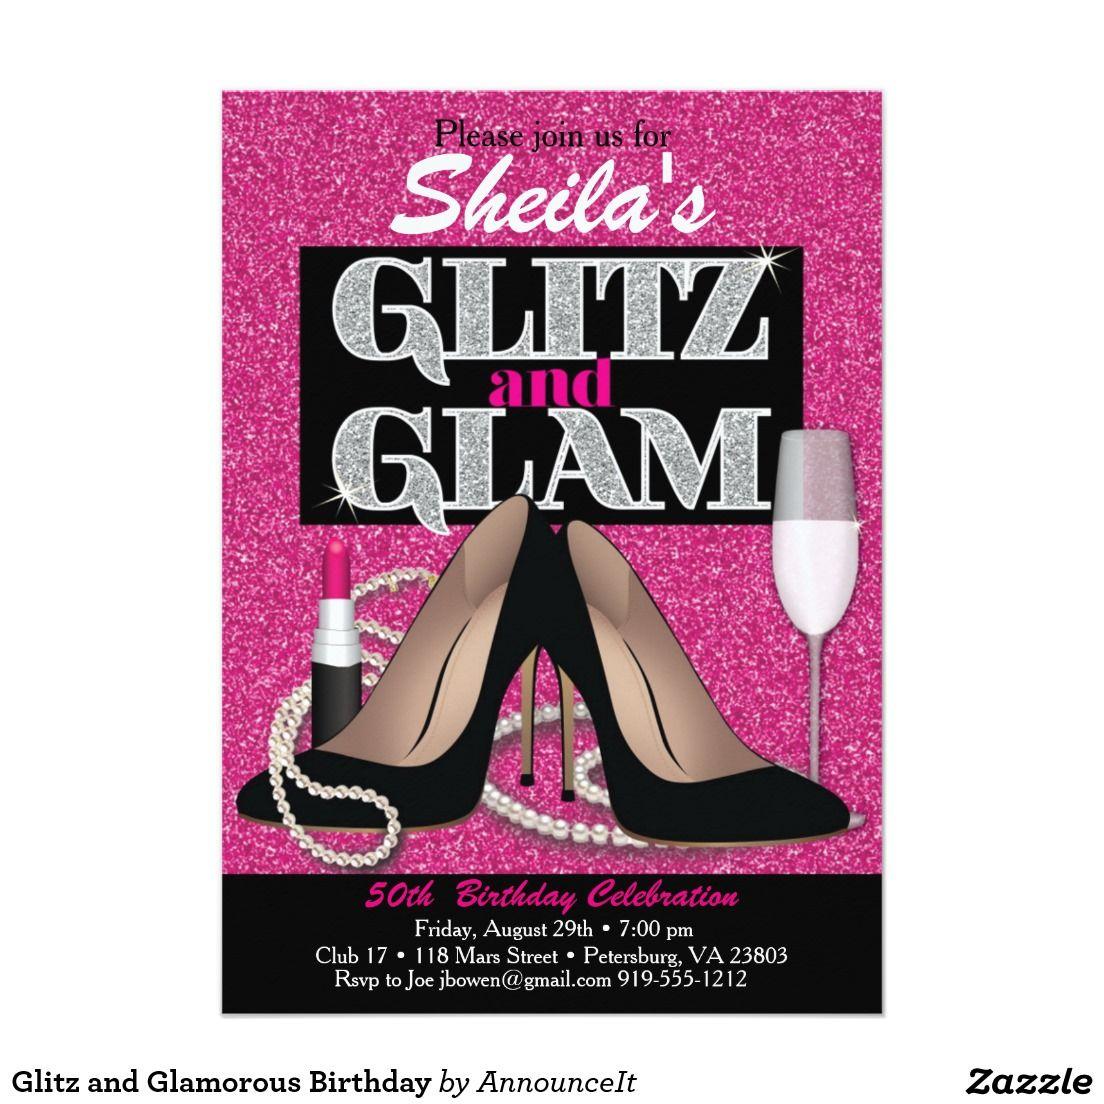 Glitz and Glamorous Birthday Invitation